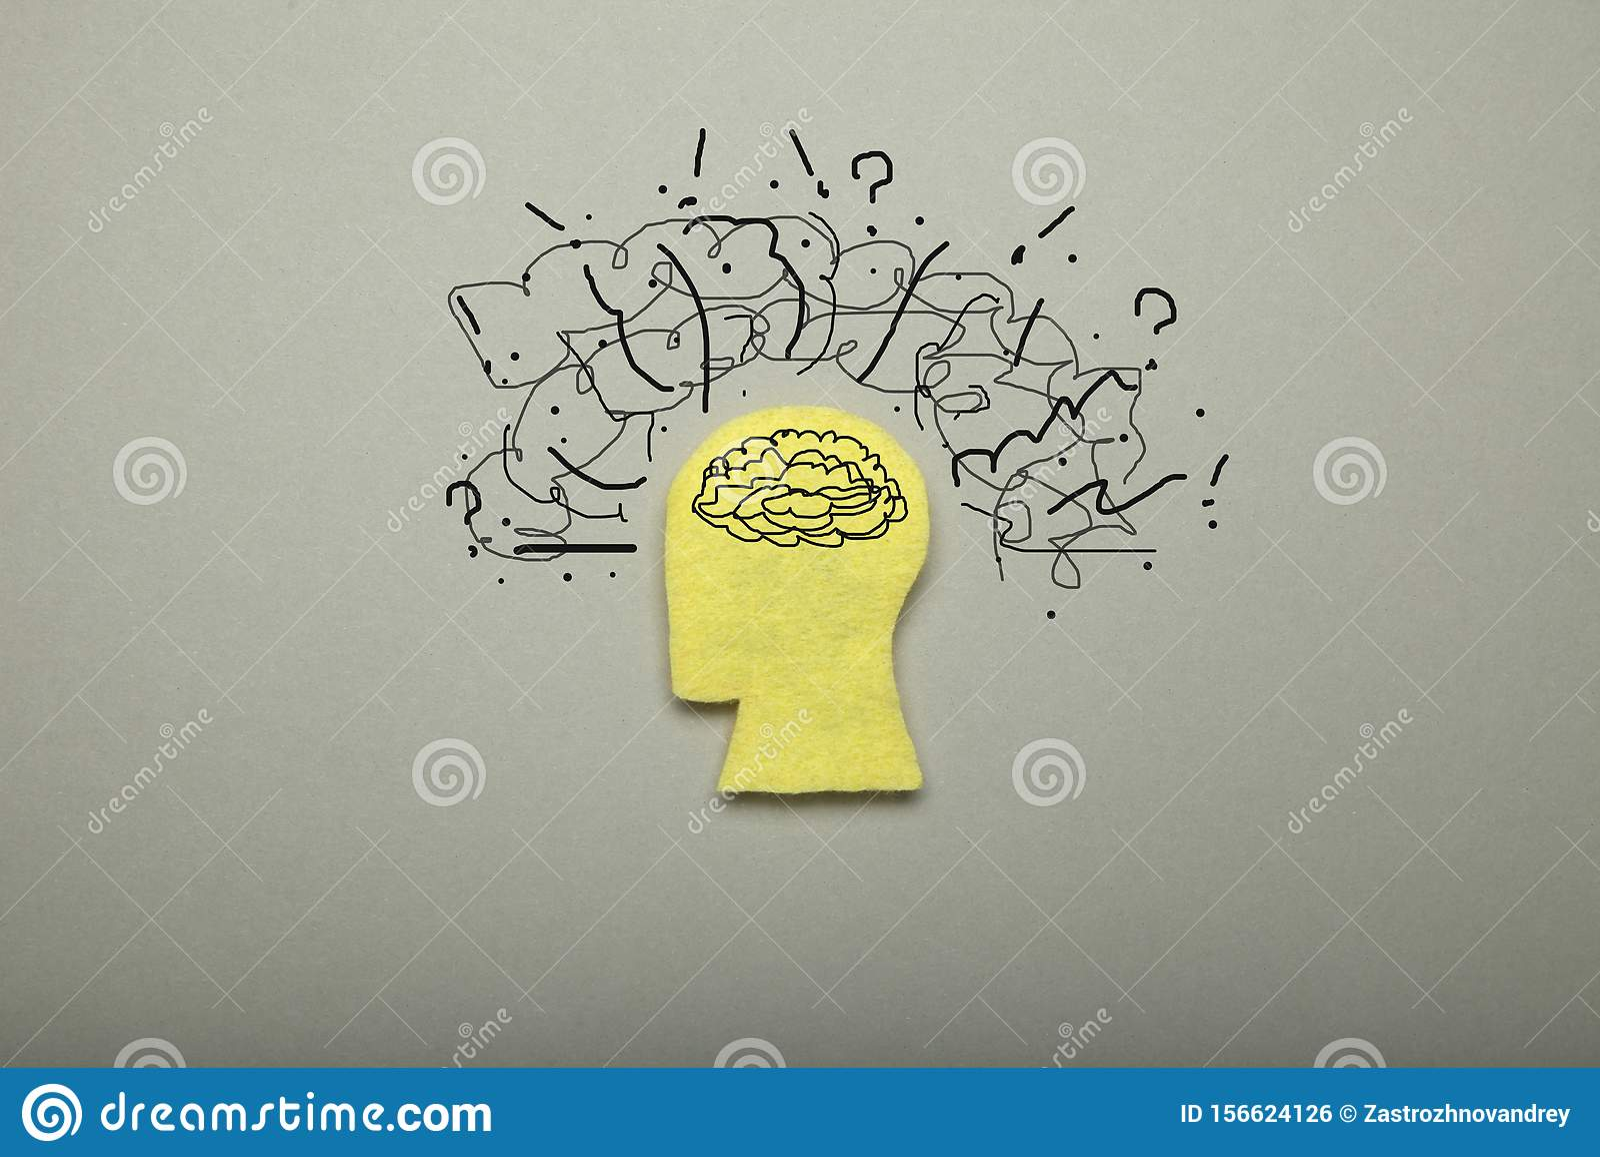 Mental Stress Mind Pressure Negative Brain Overload Stock Photo Image Of Worries Fear